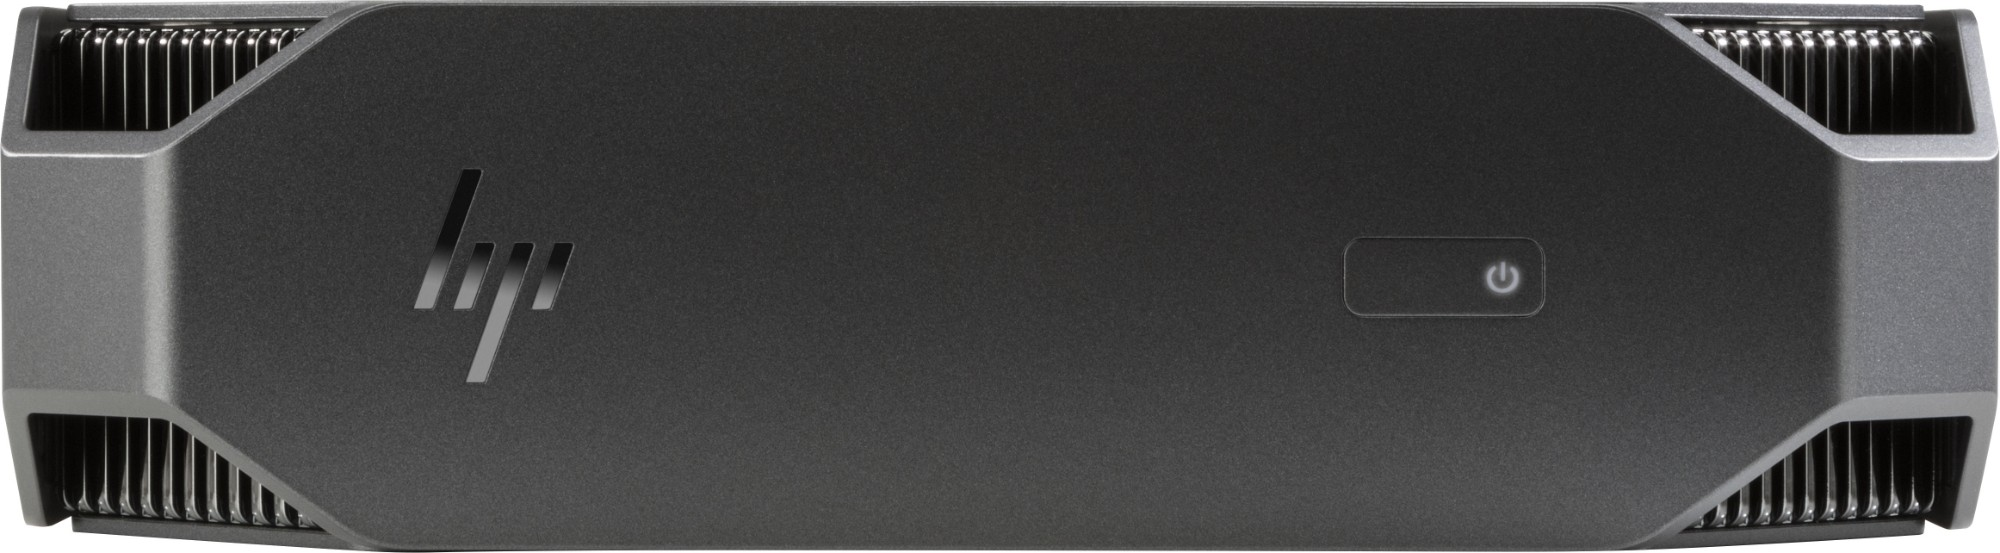 HP Z2 G4 9th gen Intel® Core™ i7 i7-9700 16 GB DDR4-SDRAM 1000 GB SSD mini PC Black Workstation Windows 10 Pro